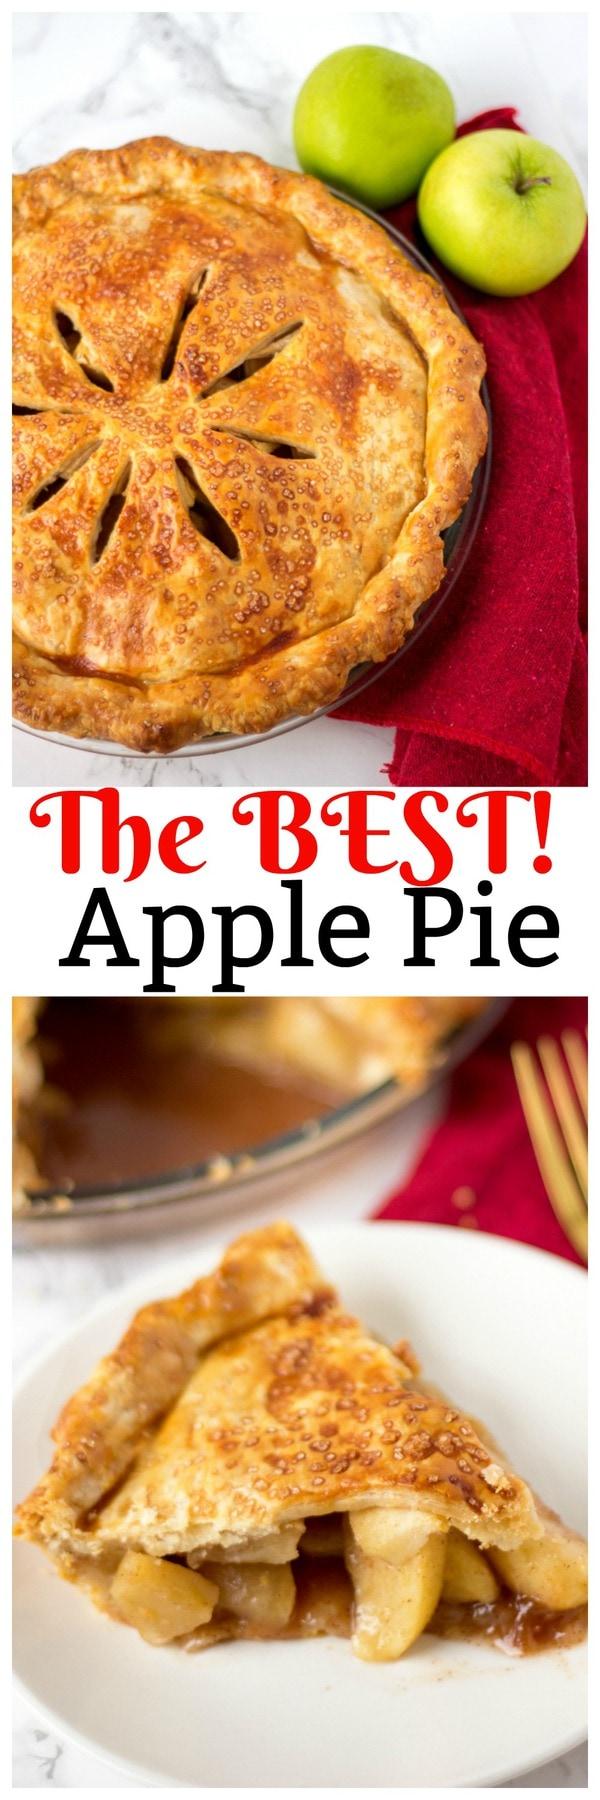 The Best Apple Pie Easy Apple Pie Recipe